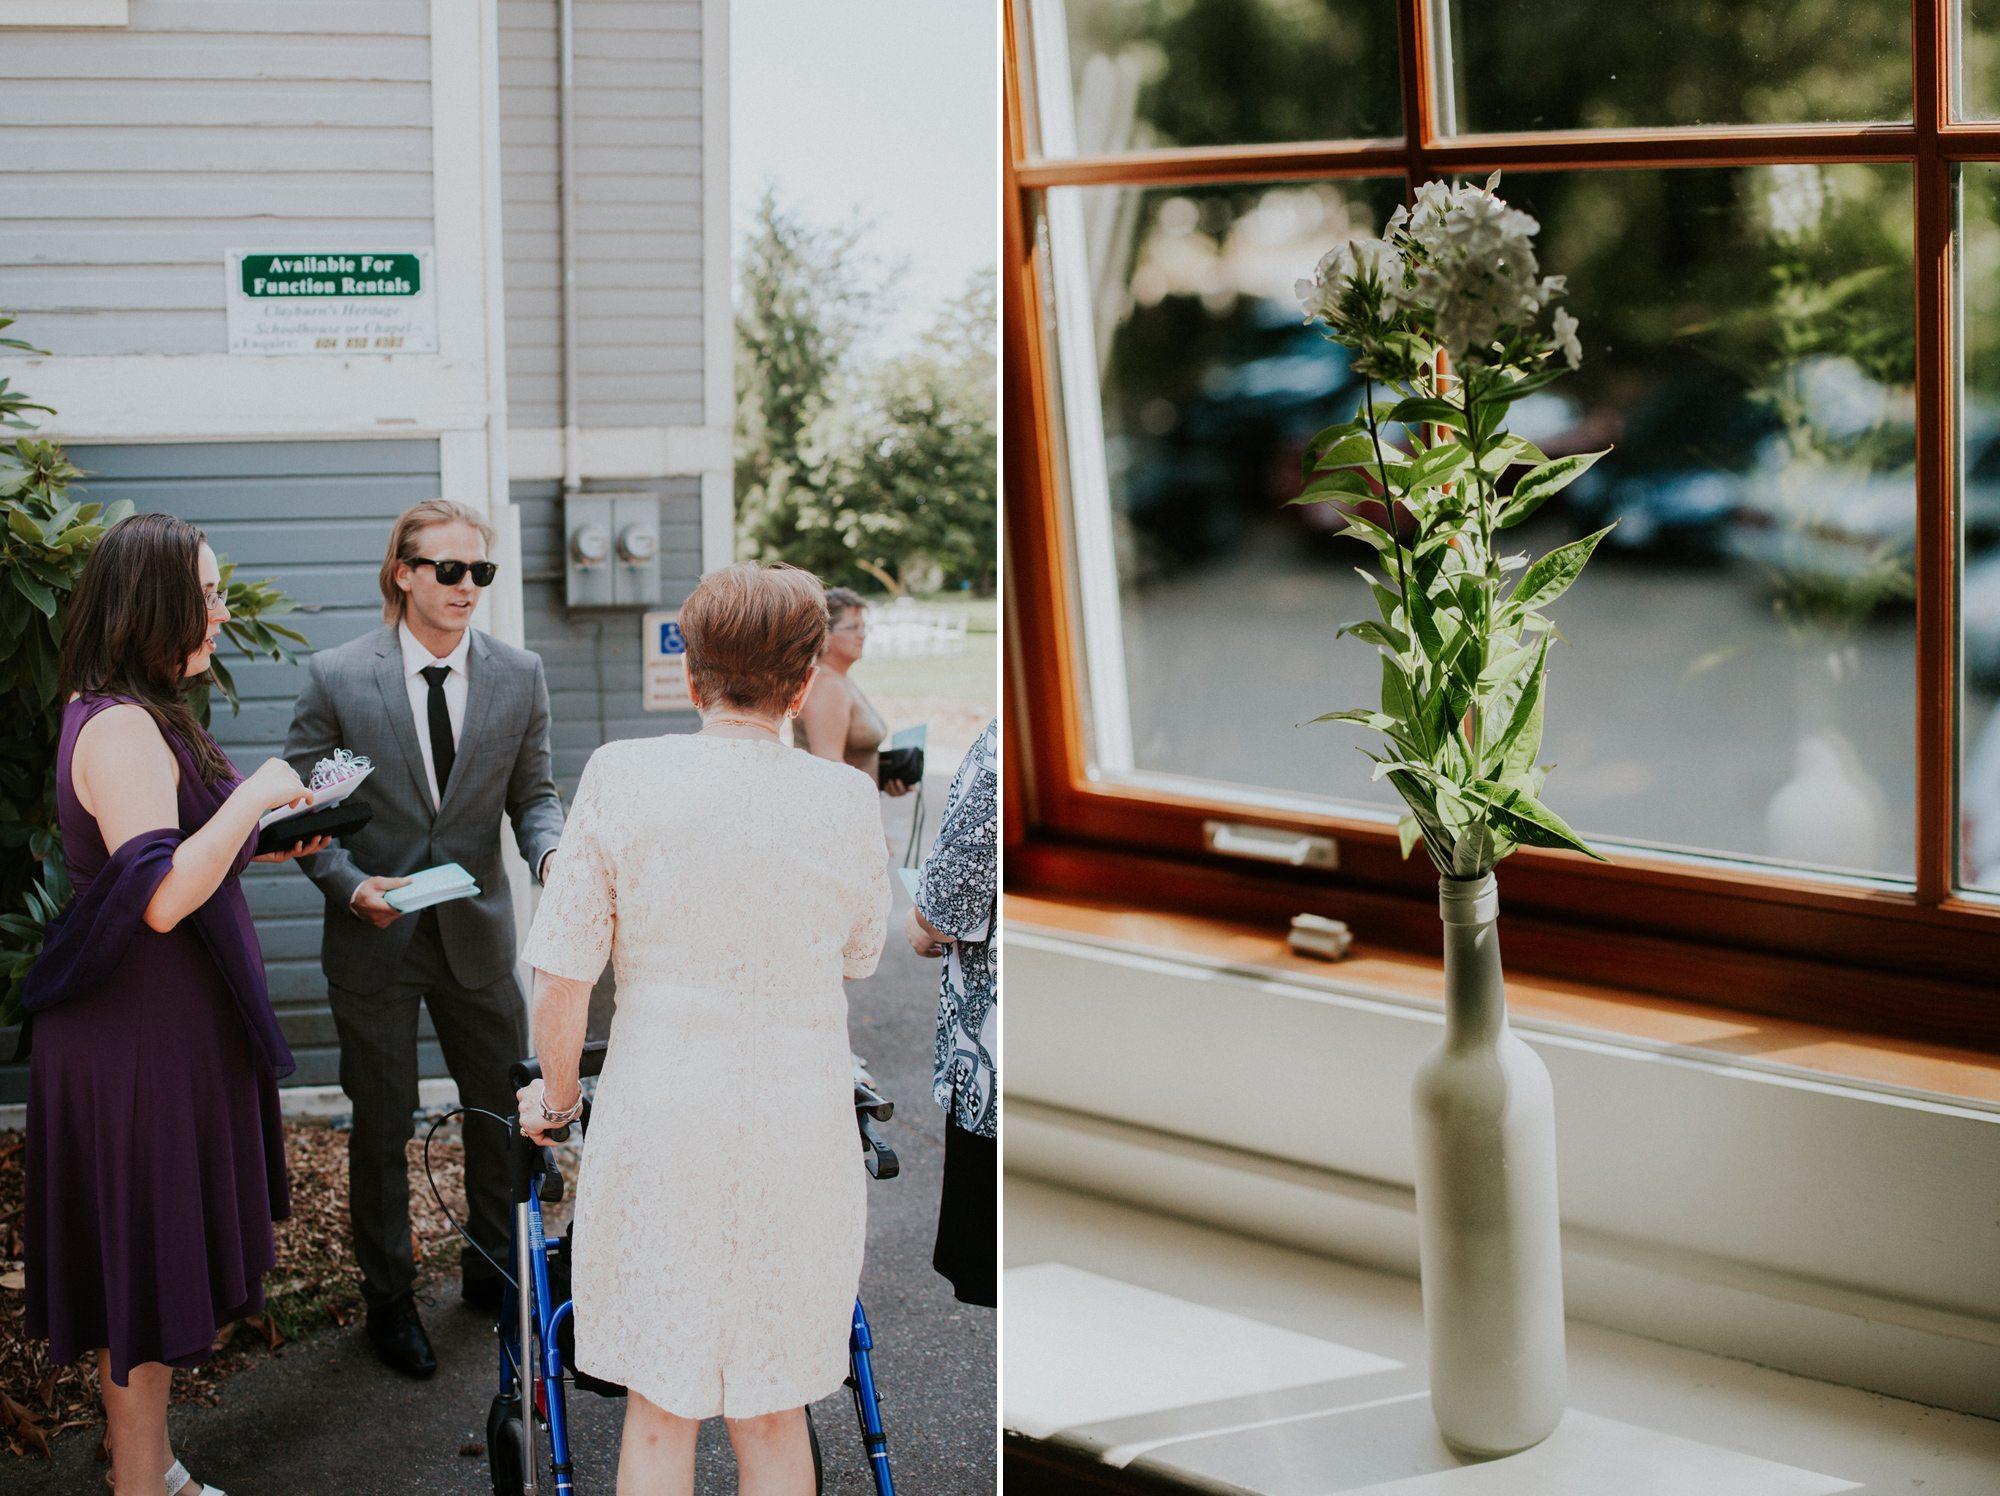 816-abbotsford-wedding-photographer